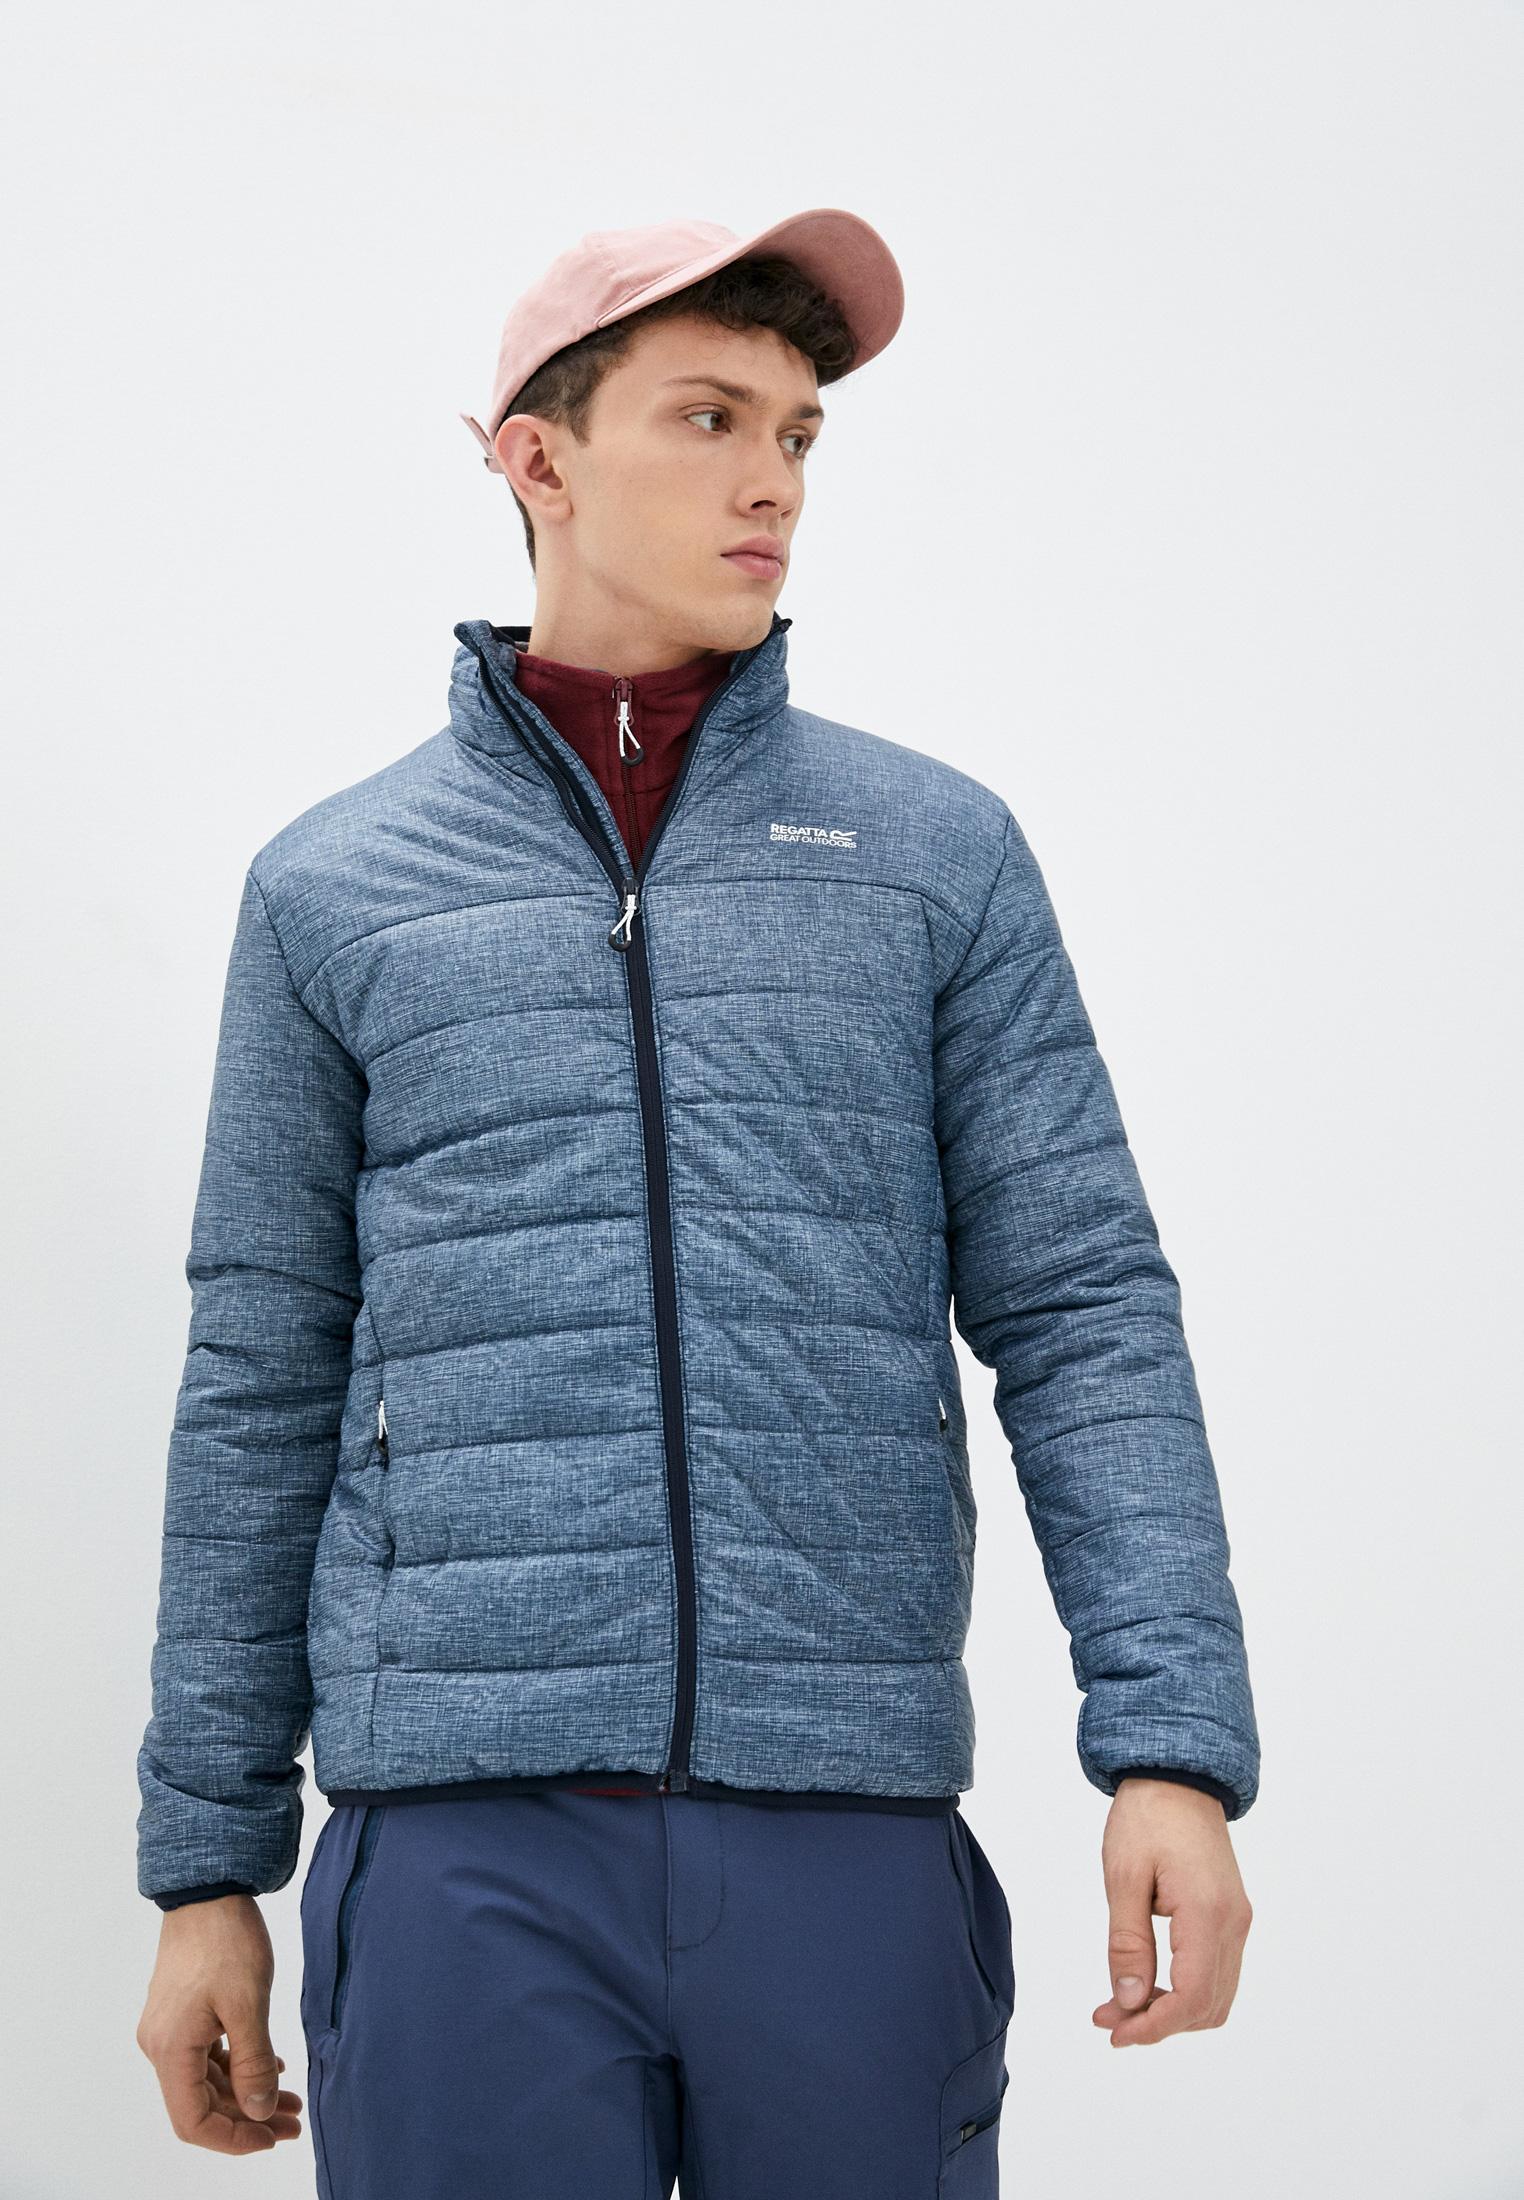 Мужская верхняя одежда REGATTA (Регатта) RMN179